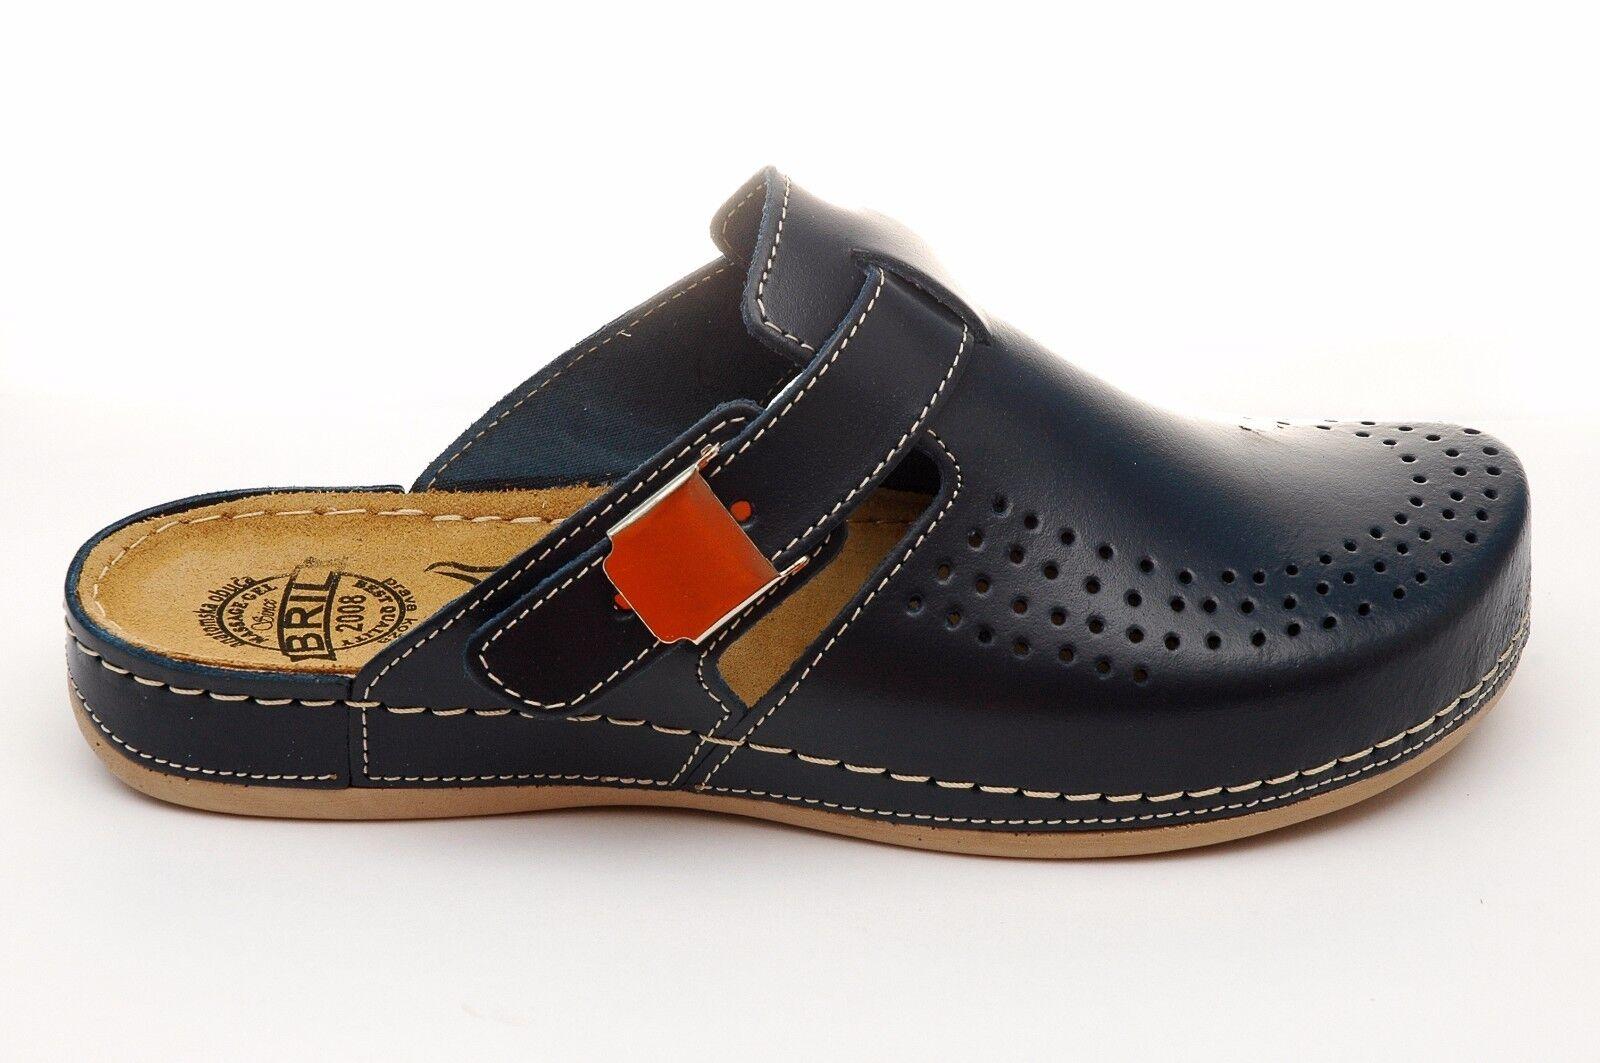 Dr Punto Rosso BRIL Y77 Damens Leder Slip On Clogs Mules Slippers Schuhes, Blau